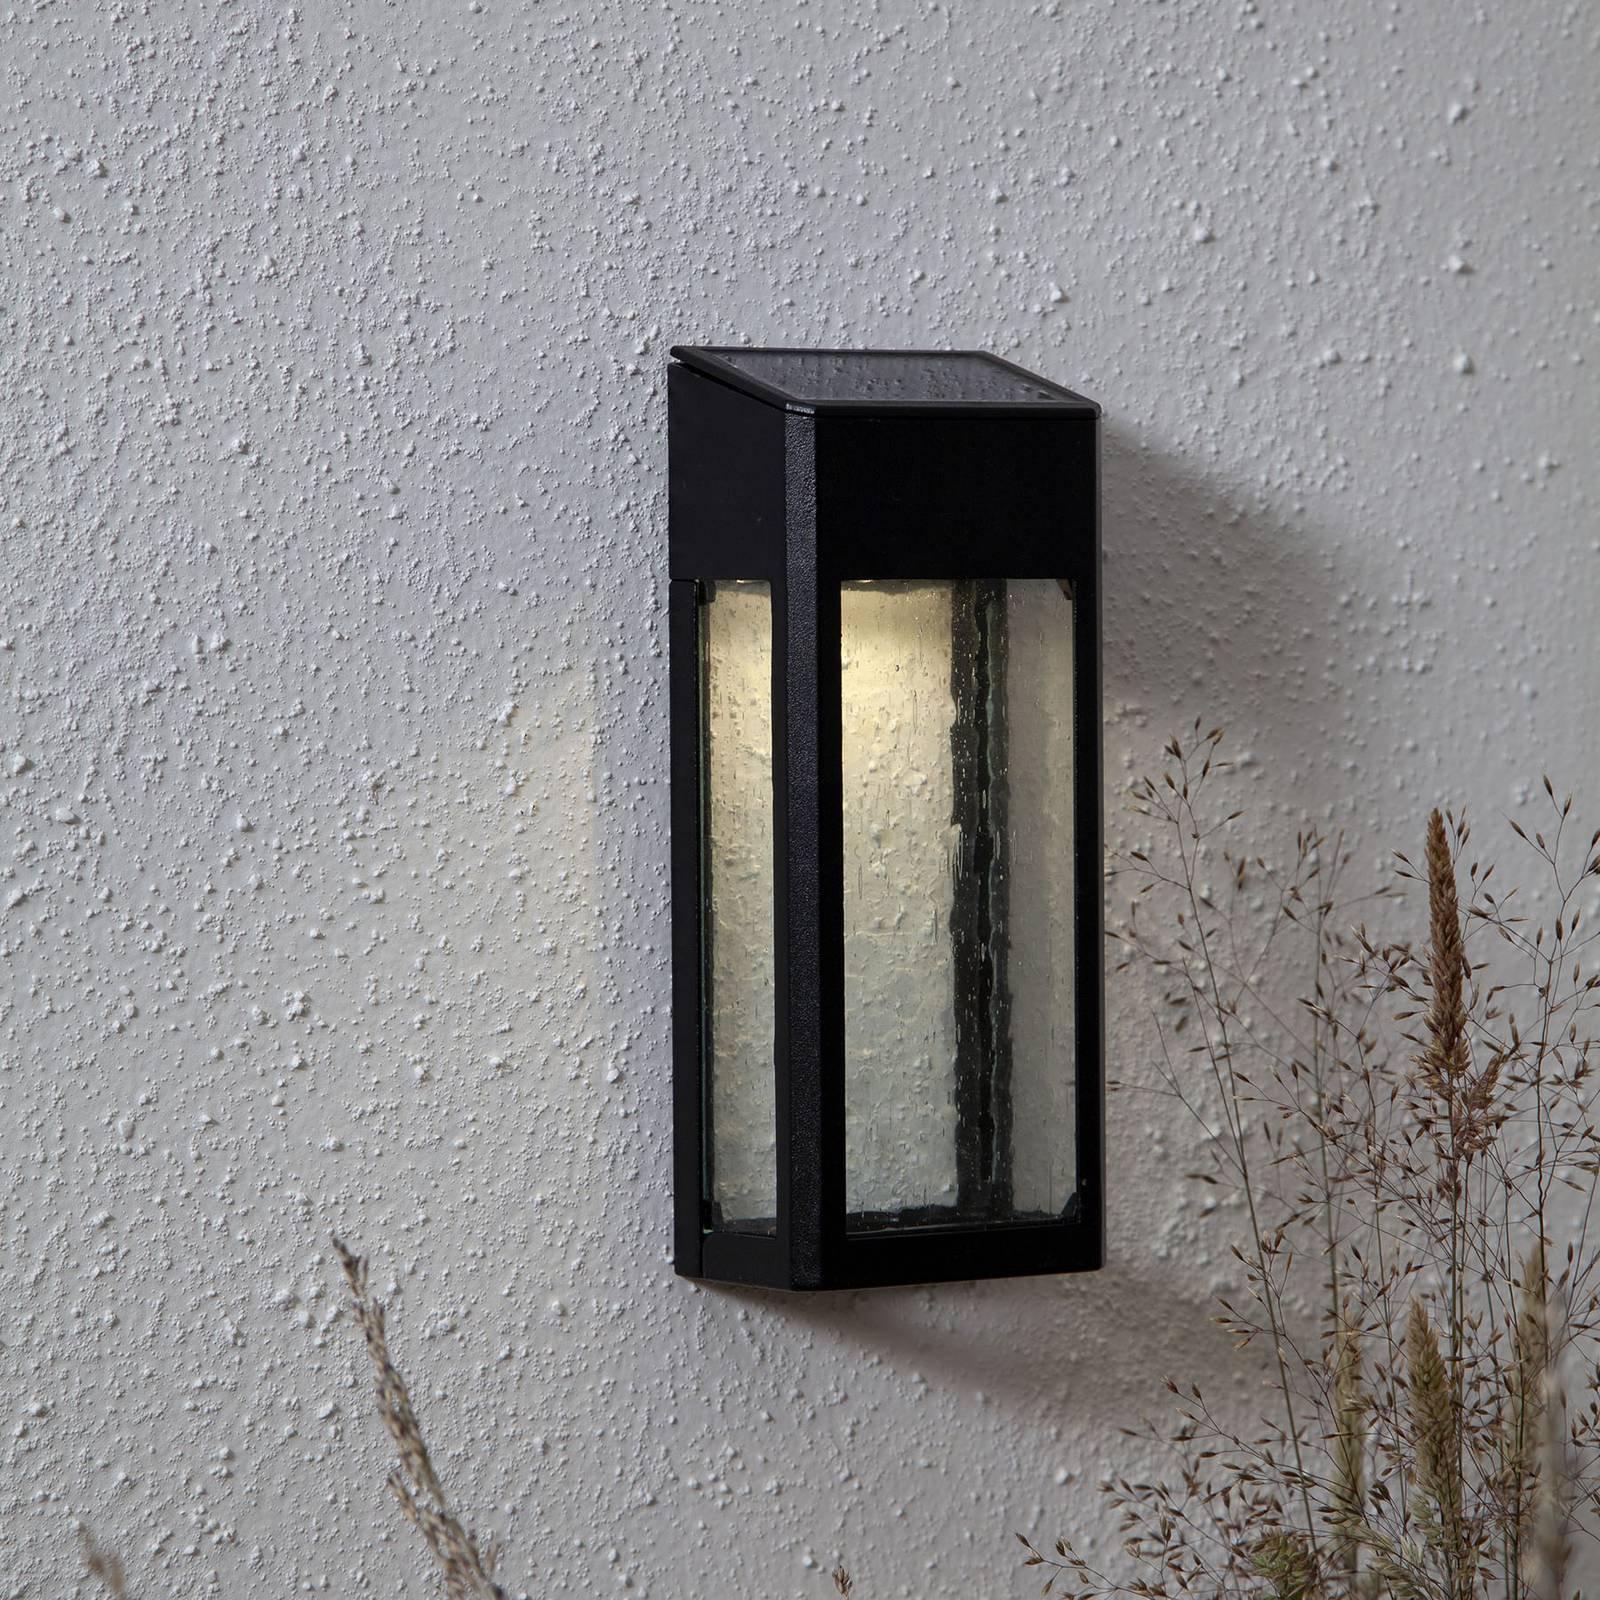 LED-solvegglampe Wally av aluminium